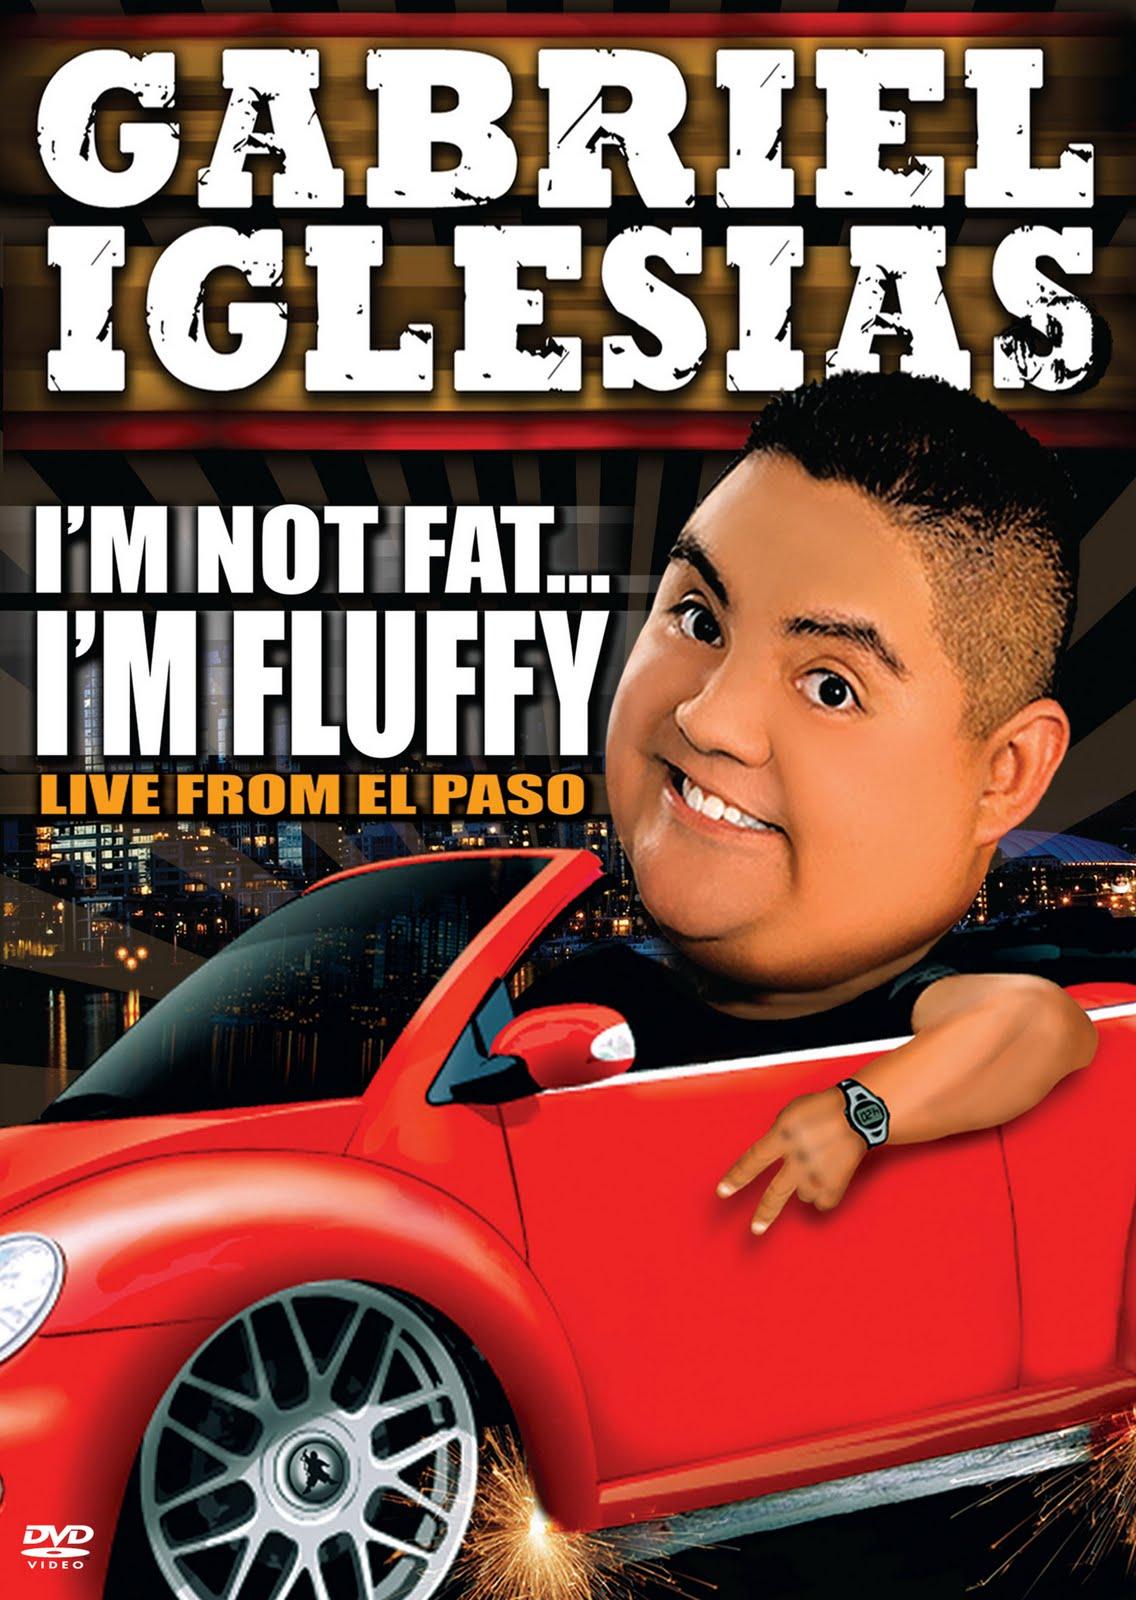 http://1.bp.blogspot.com/_P6GV9bSRGPU/TED0xF3yFTI/AAAAAAAAAaU/KohjlpxxEmI/s1600/GabrielIglesias_NotFat-600.jpg